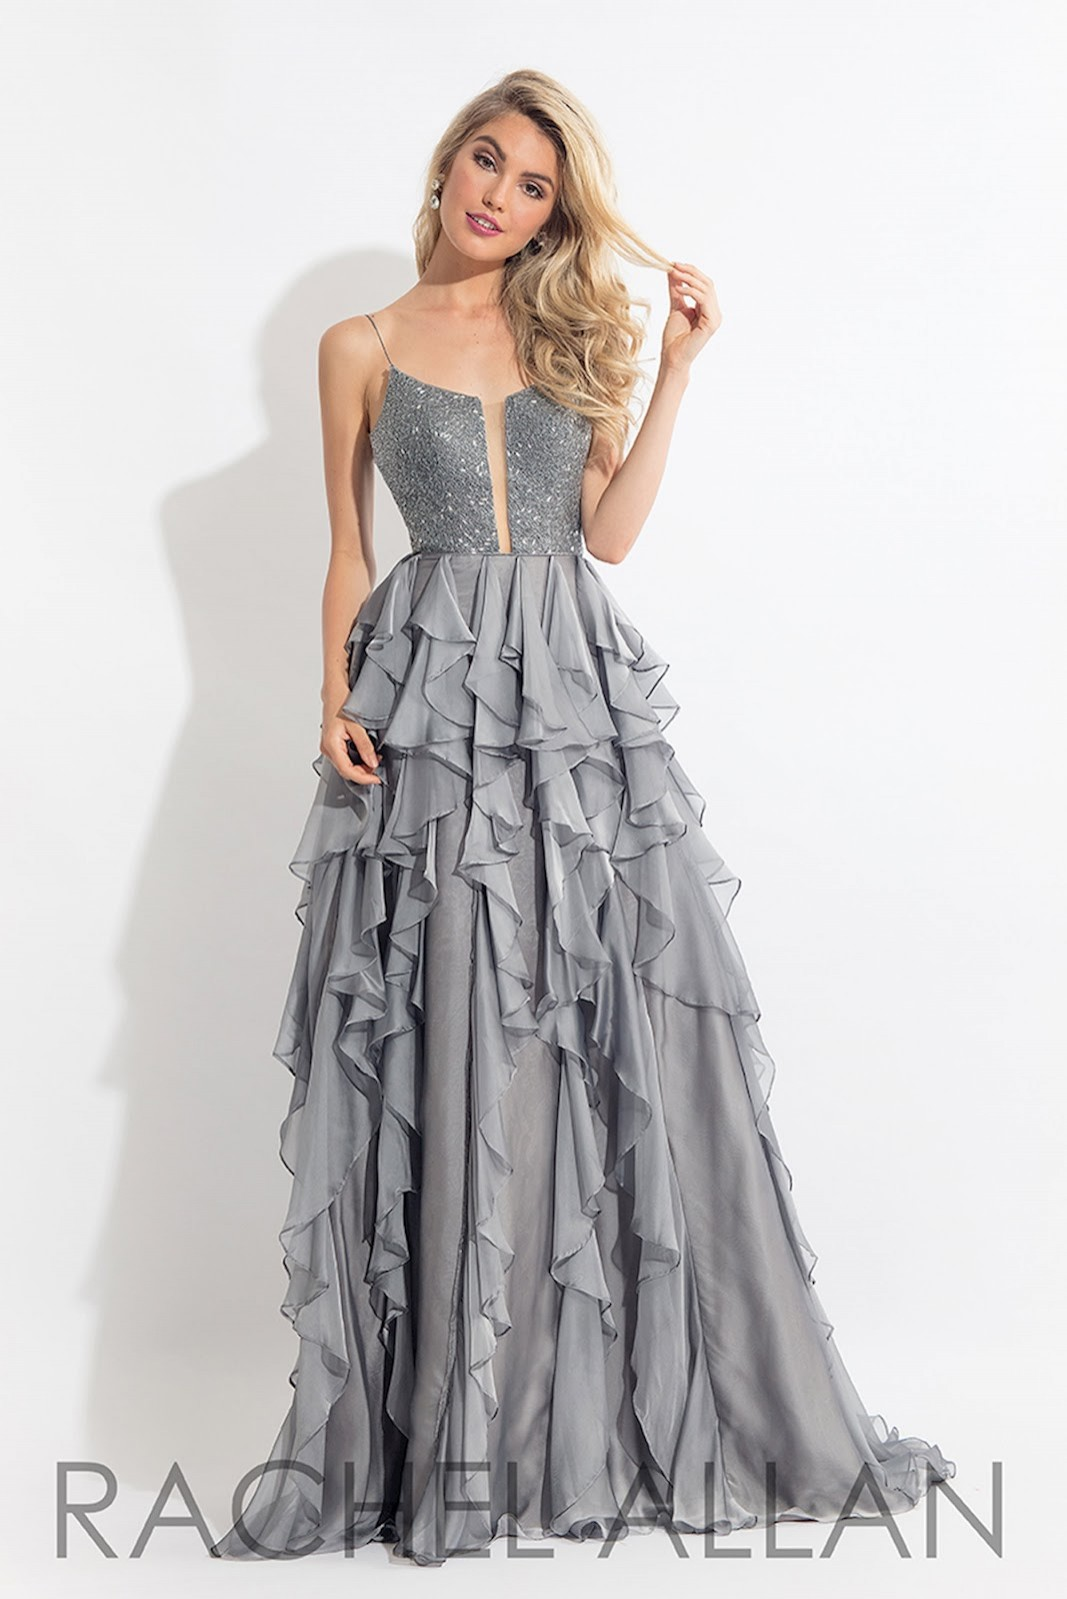 Rachel Allan Embellished top w/ ruffle skirt #6092